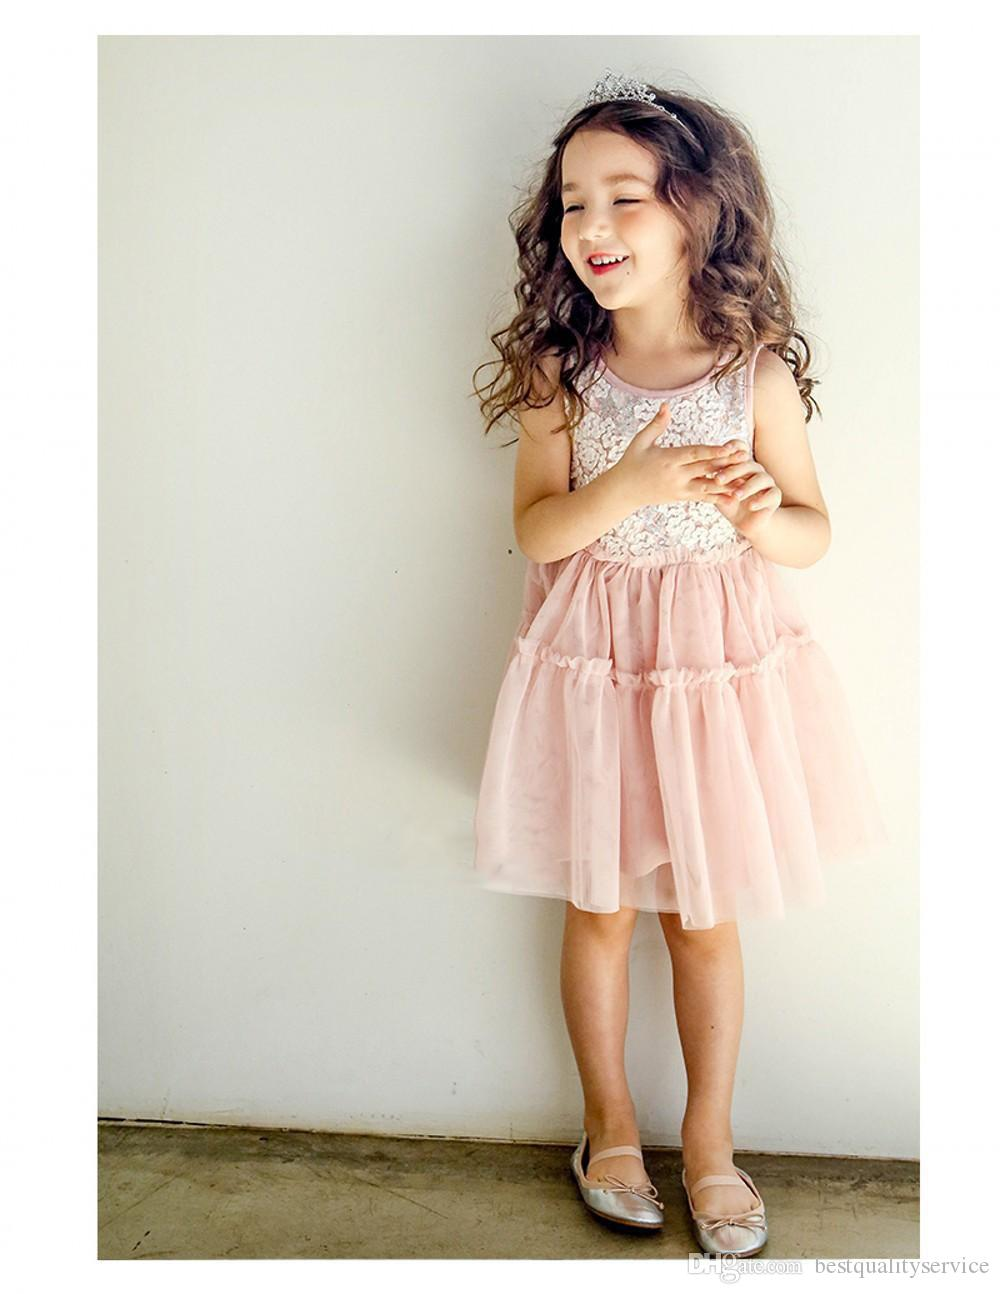 34756fde3 ... Girls dresses kids lace flowers embroidery vest dress children splicing  lace tulle princess dress summer children s ...